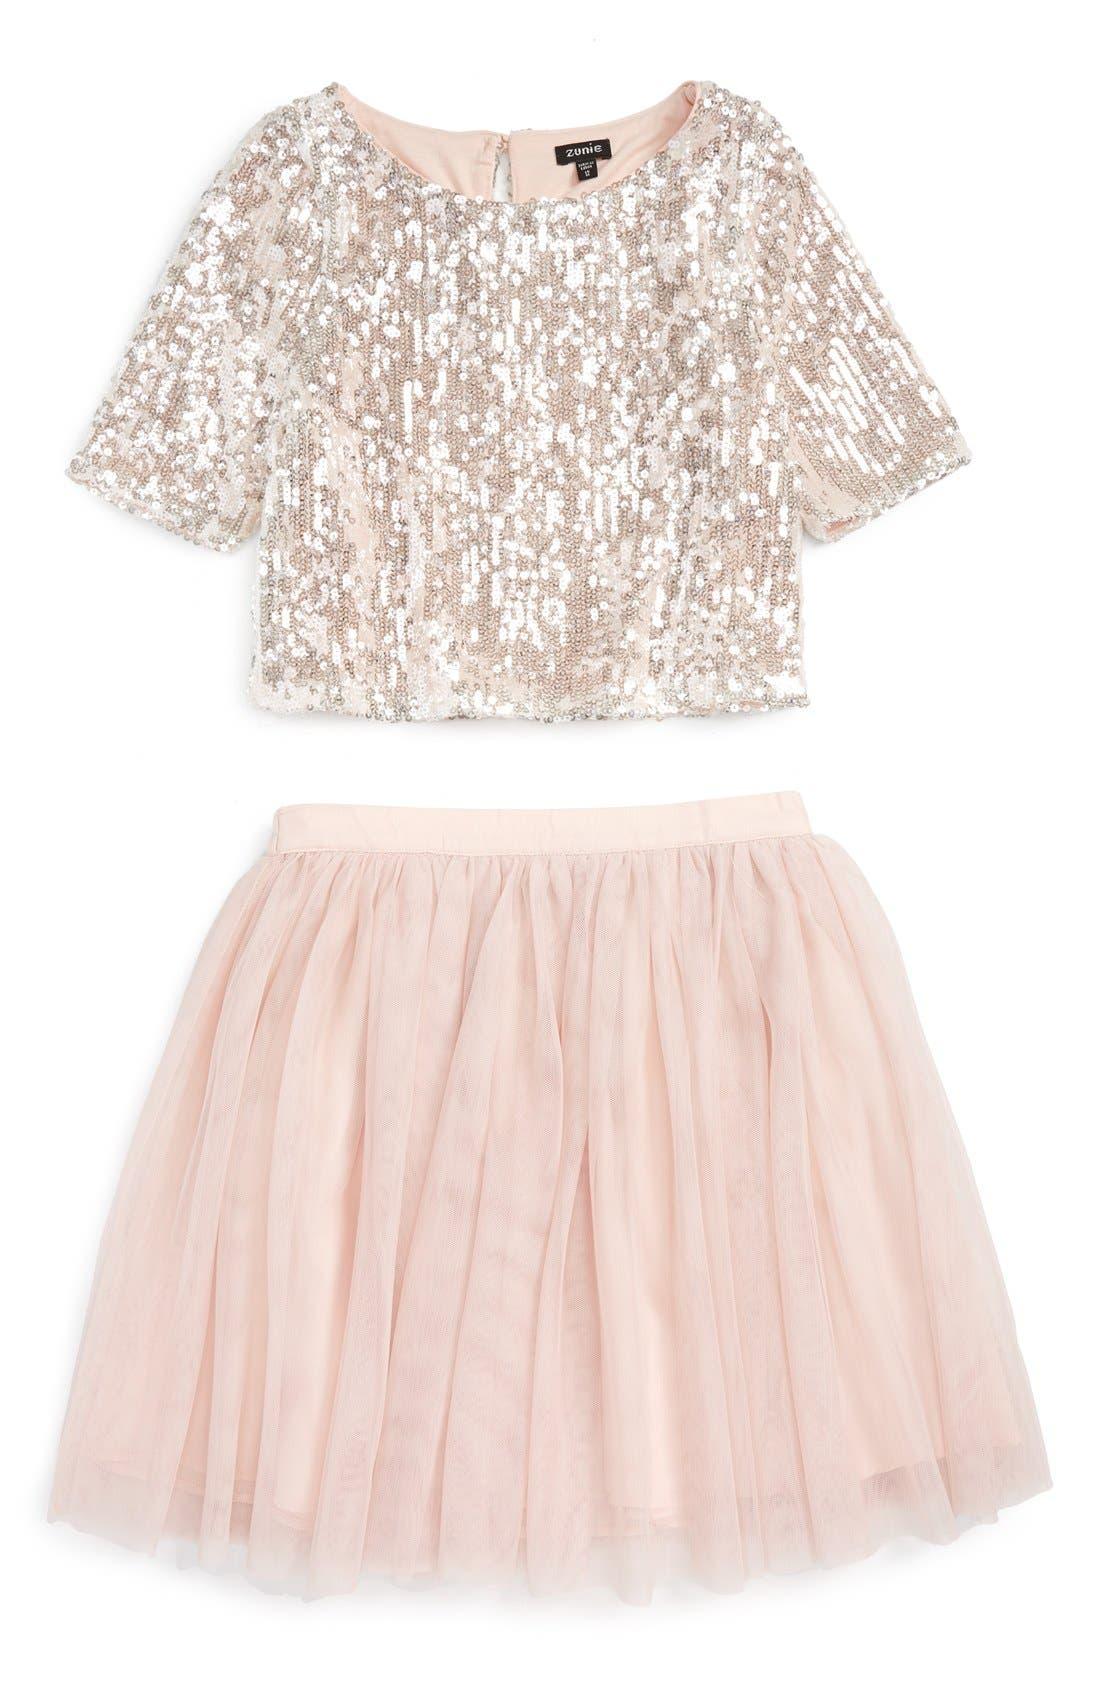 Alternate Image 1 Selected - Zunie Sequin 'Meet & Greet' Top & Tulle Skirt Set (Big Girls)